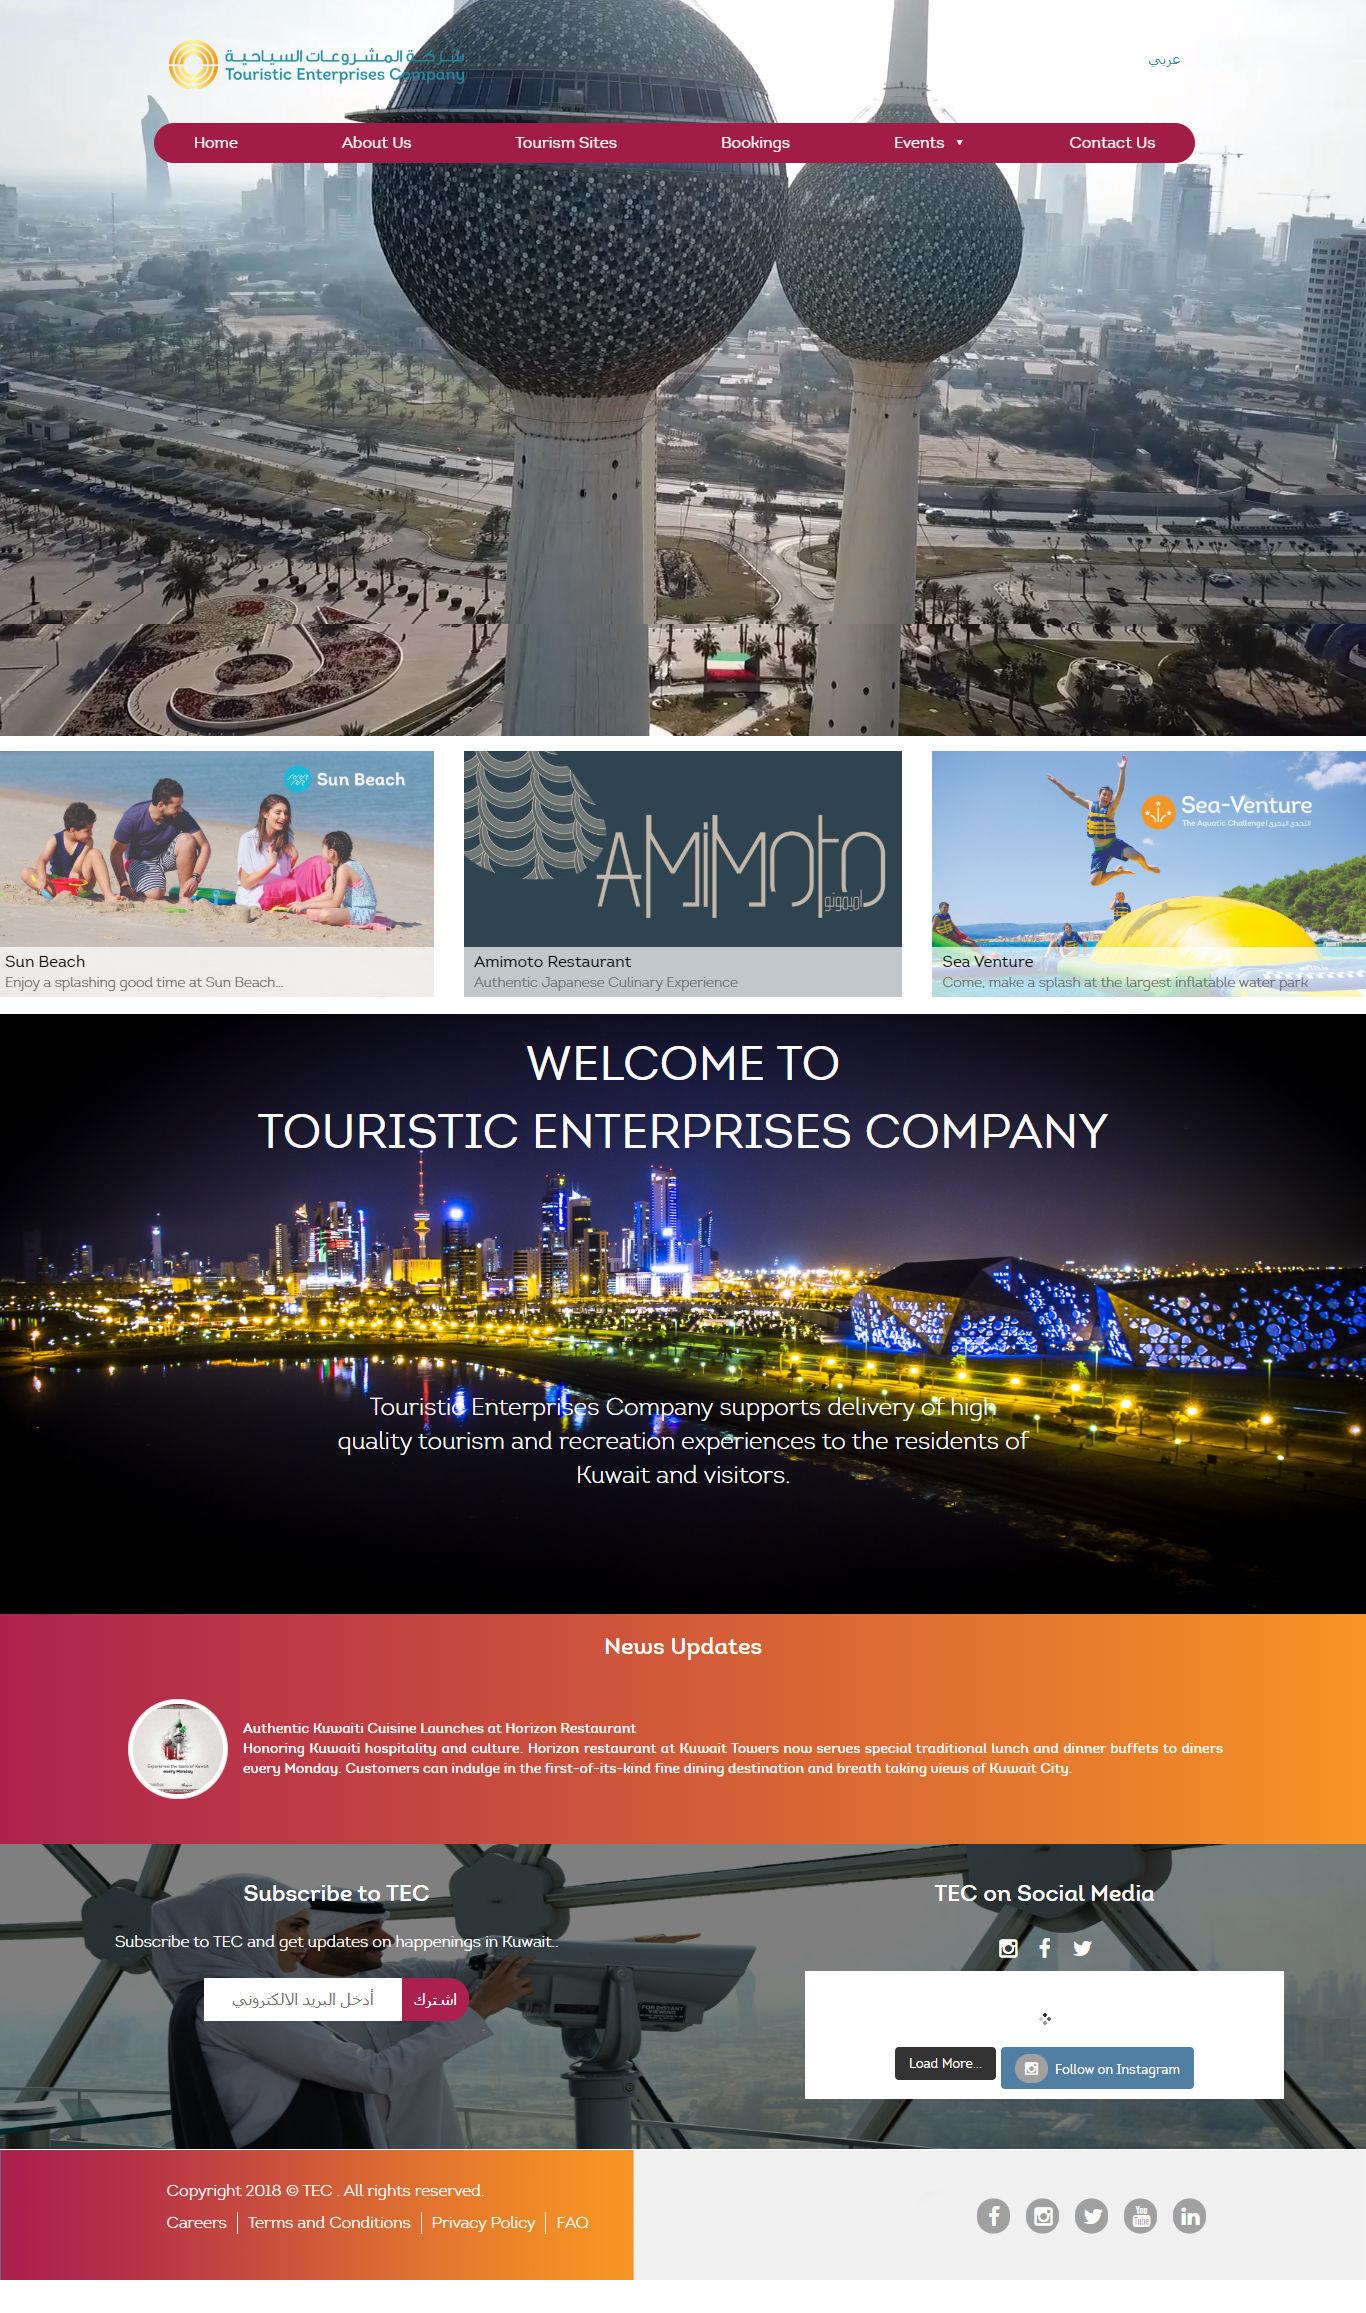 Kuwait Tourism